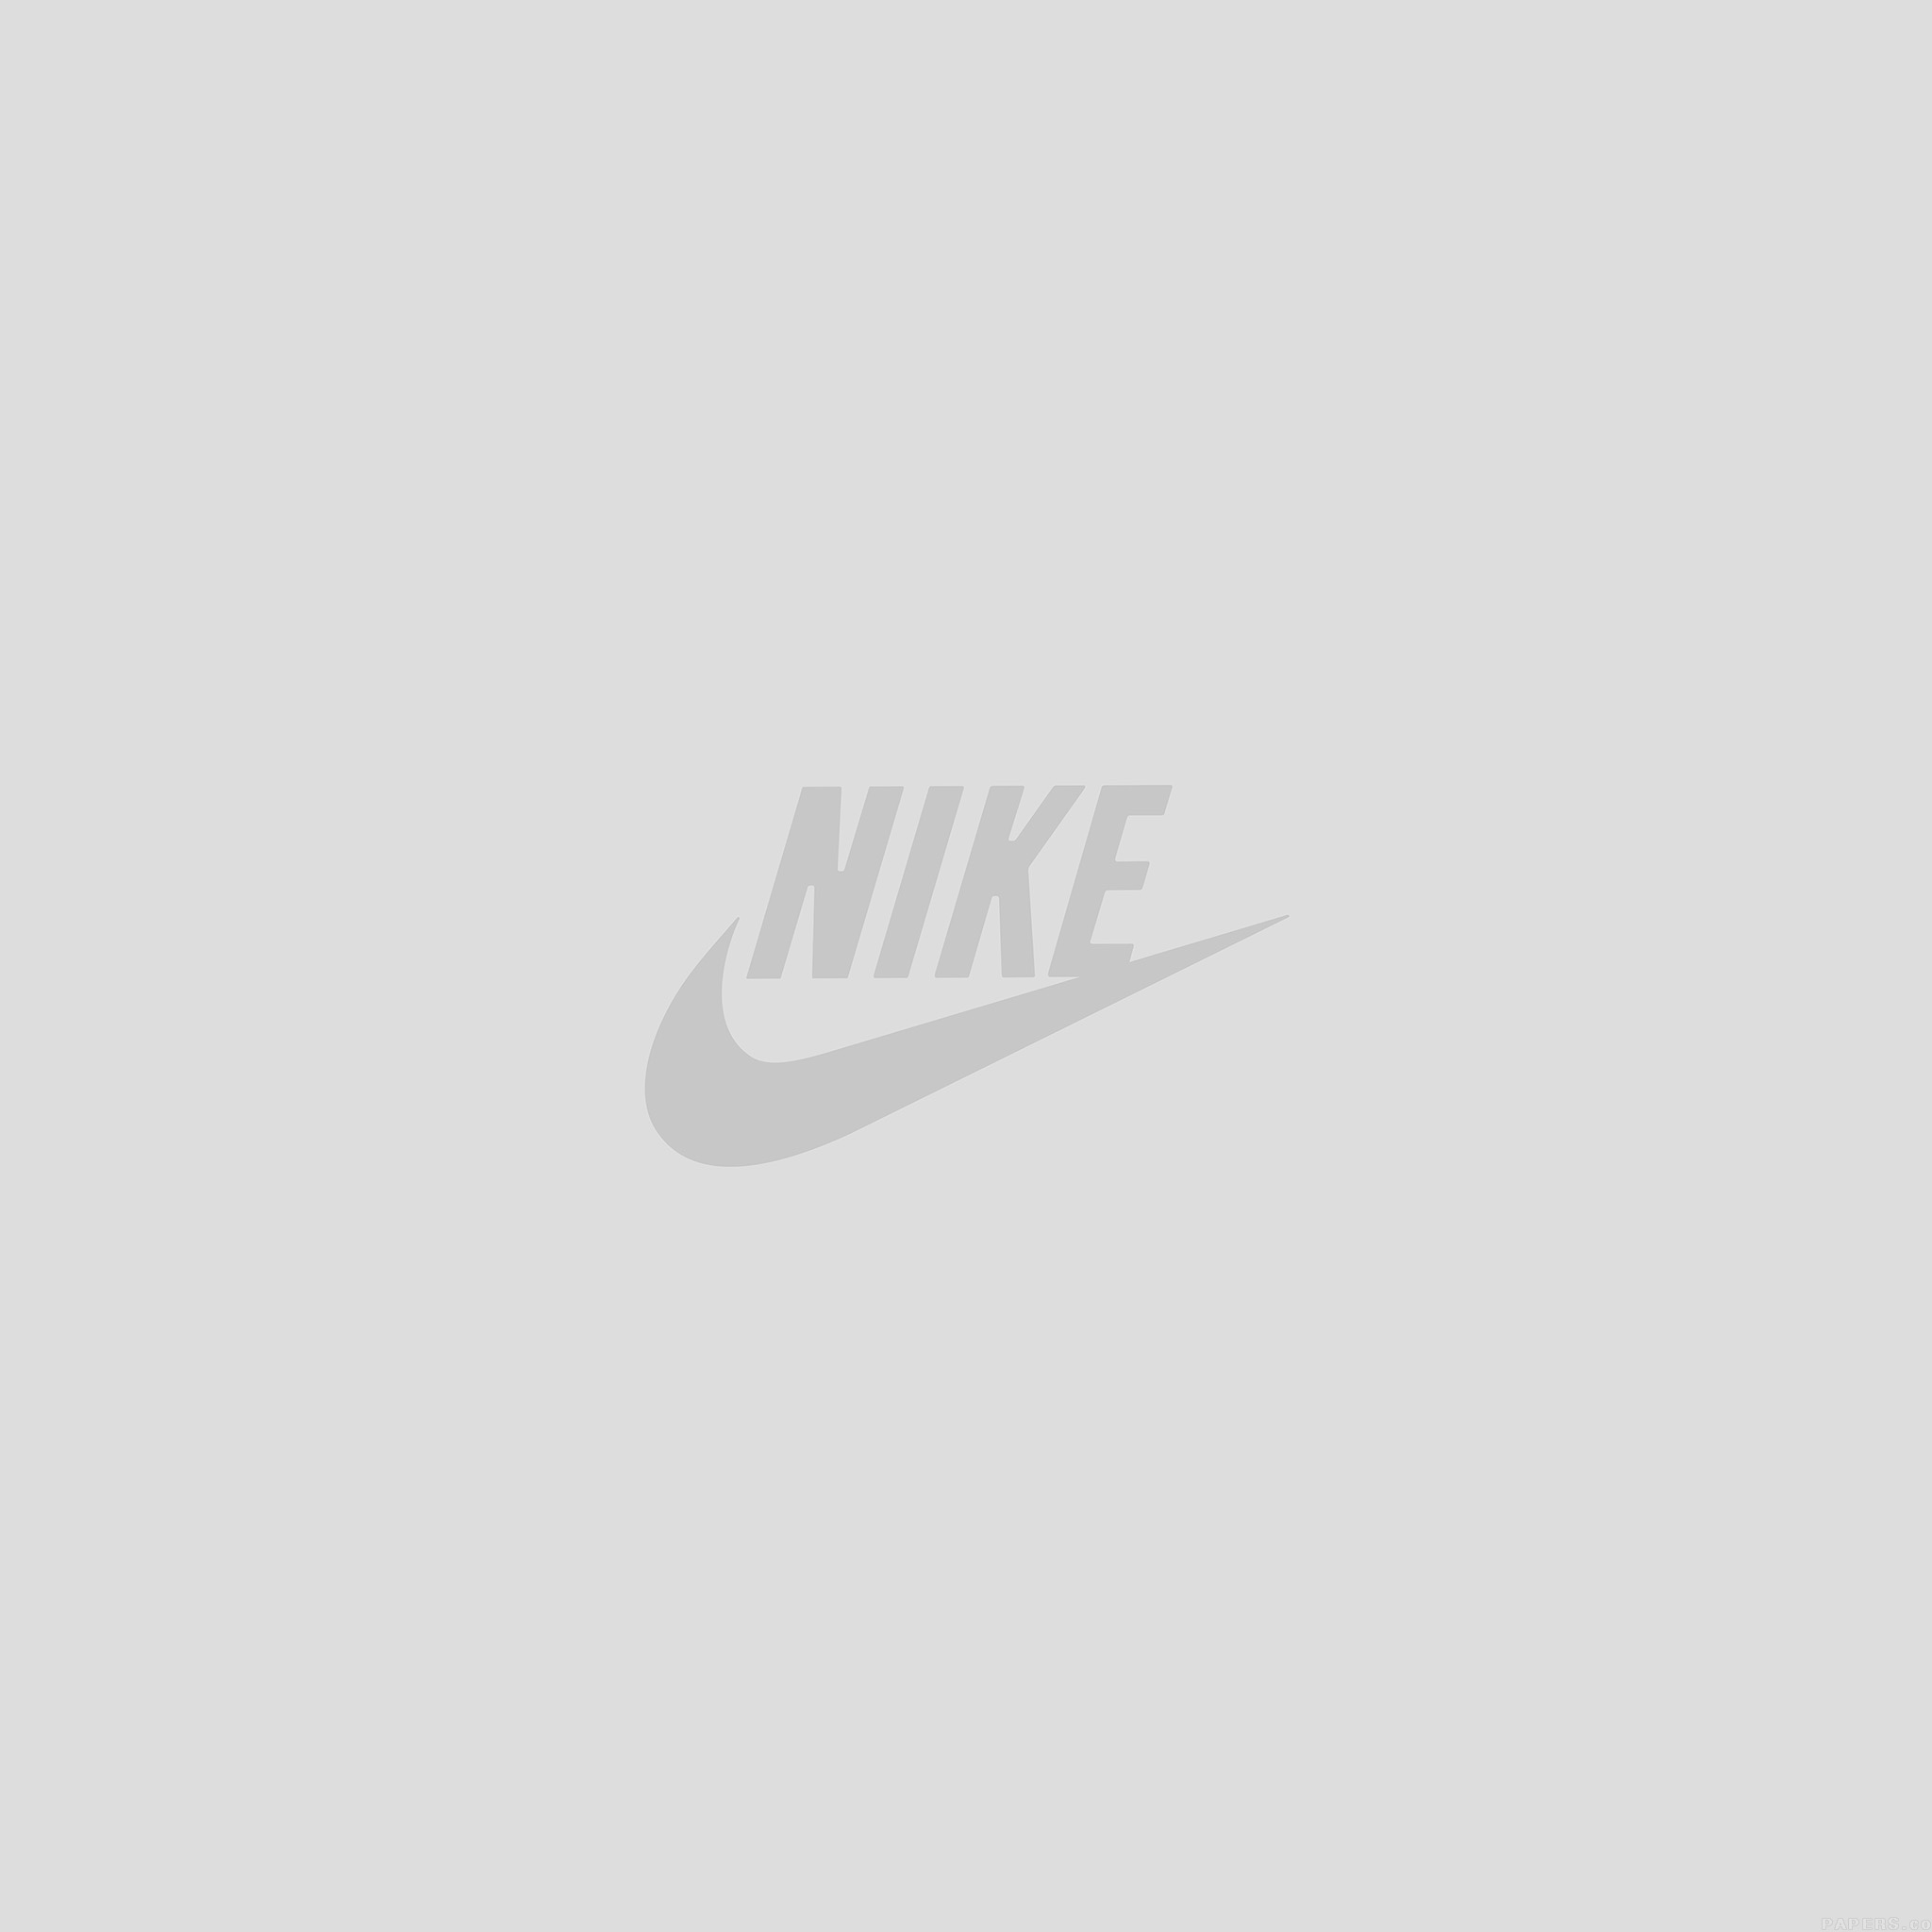 Al87-nike-logo-sports-art-minimal-simple-white-wallpaper